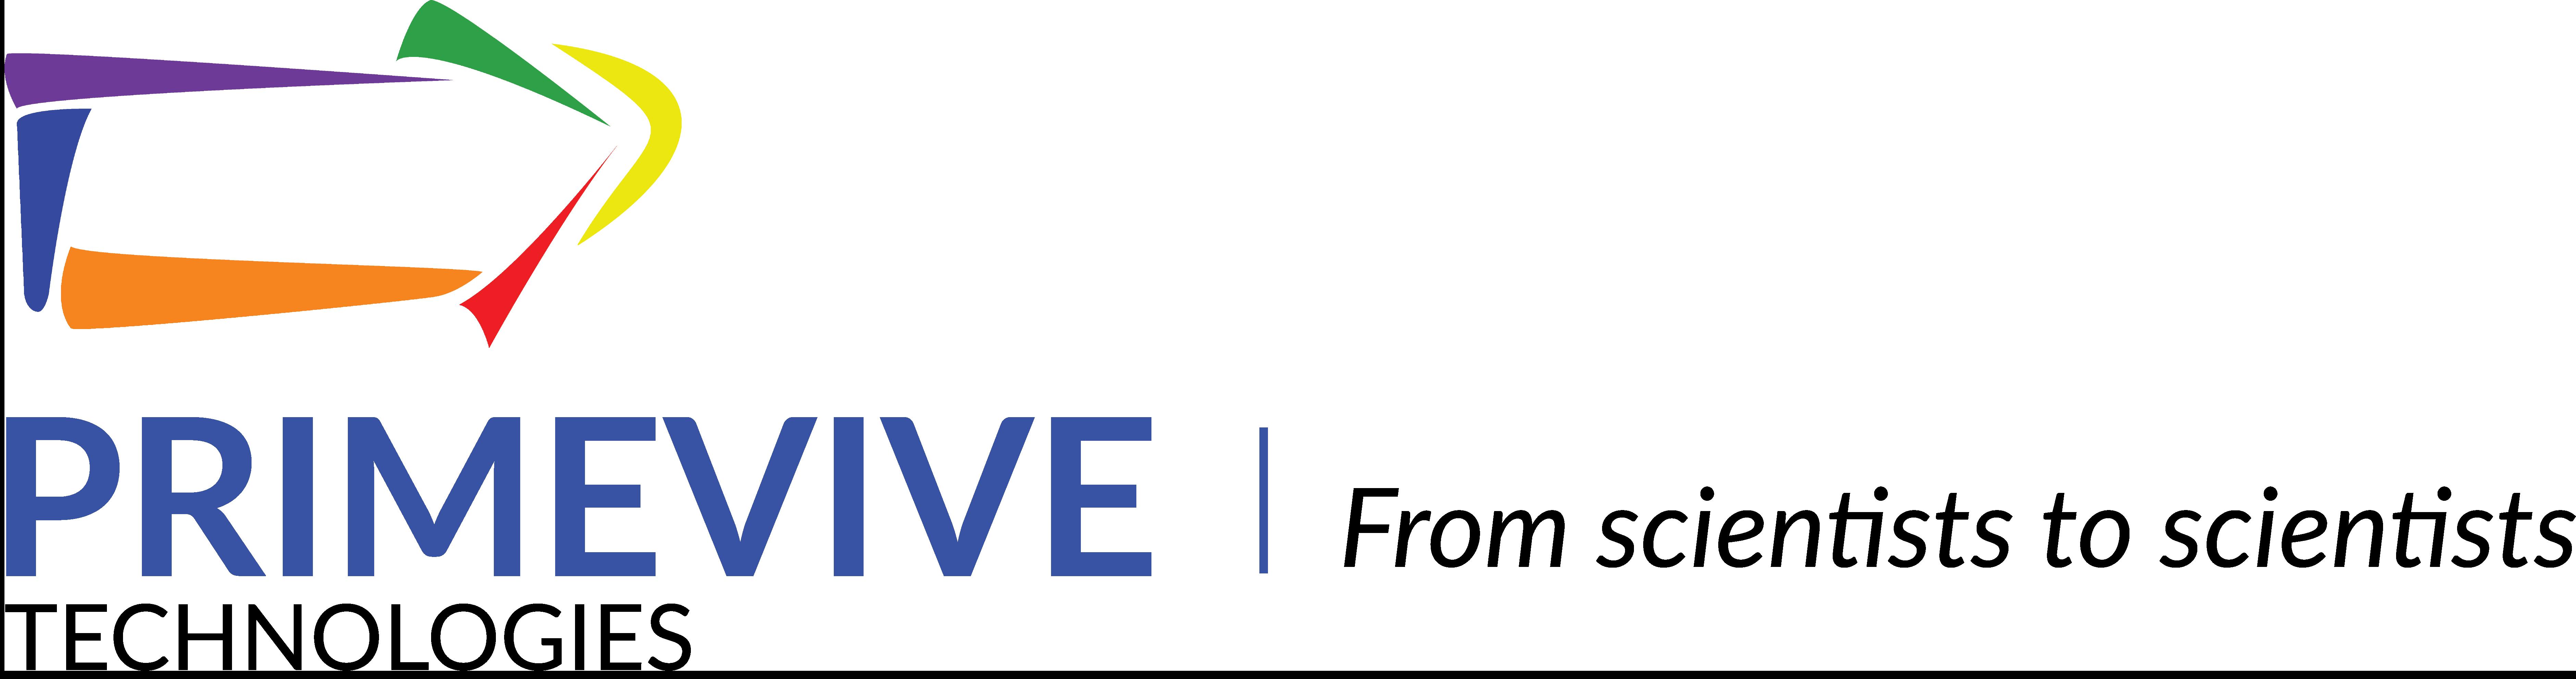 Primevive Technologies